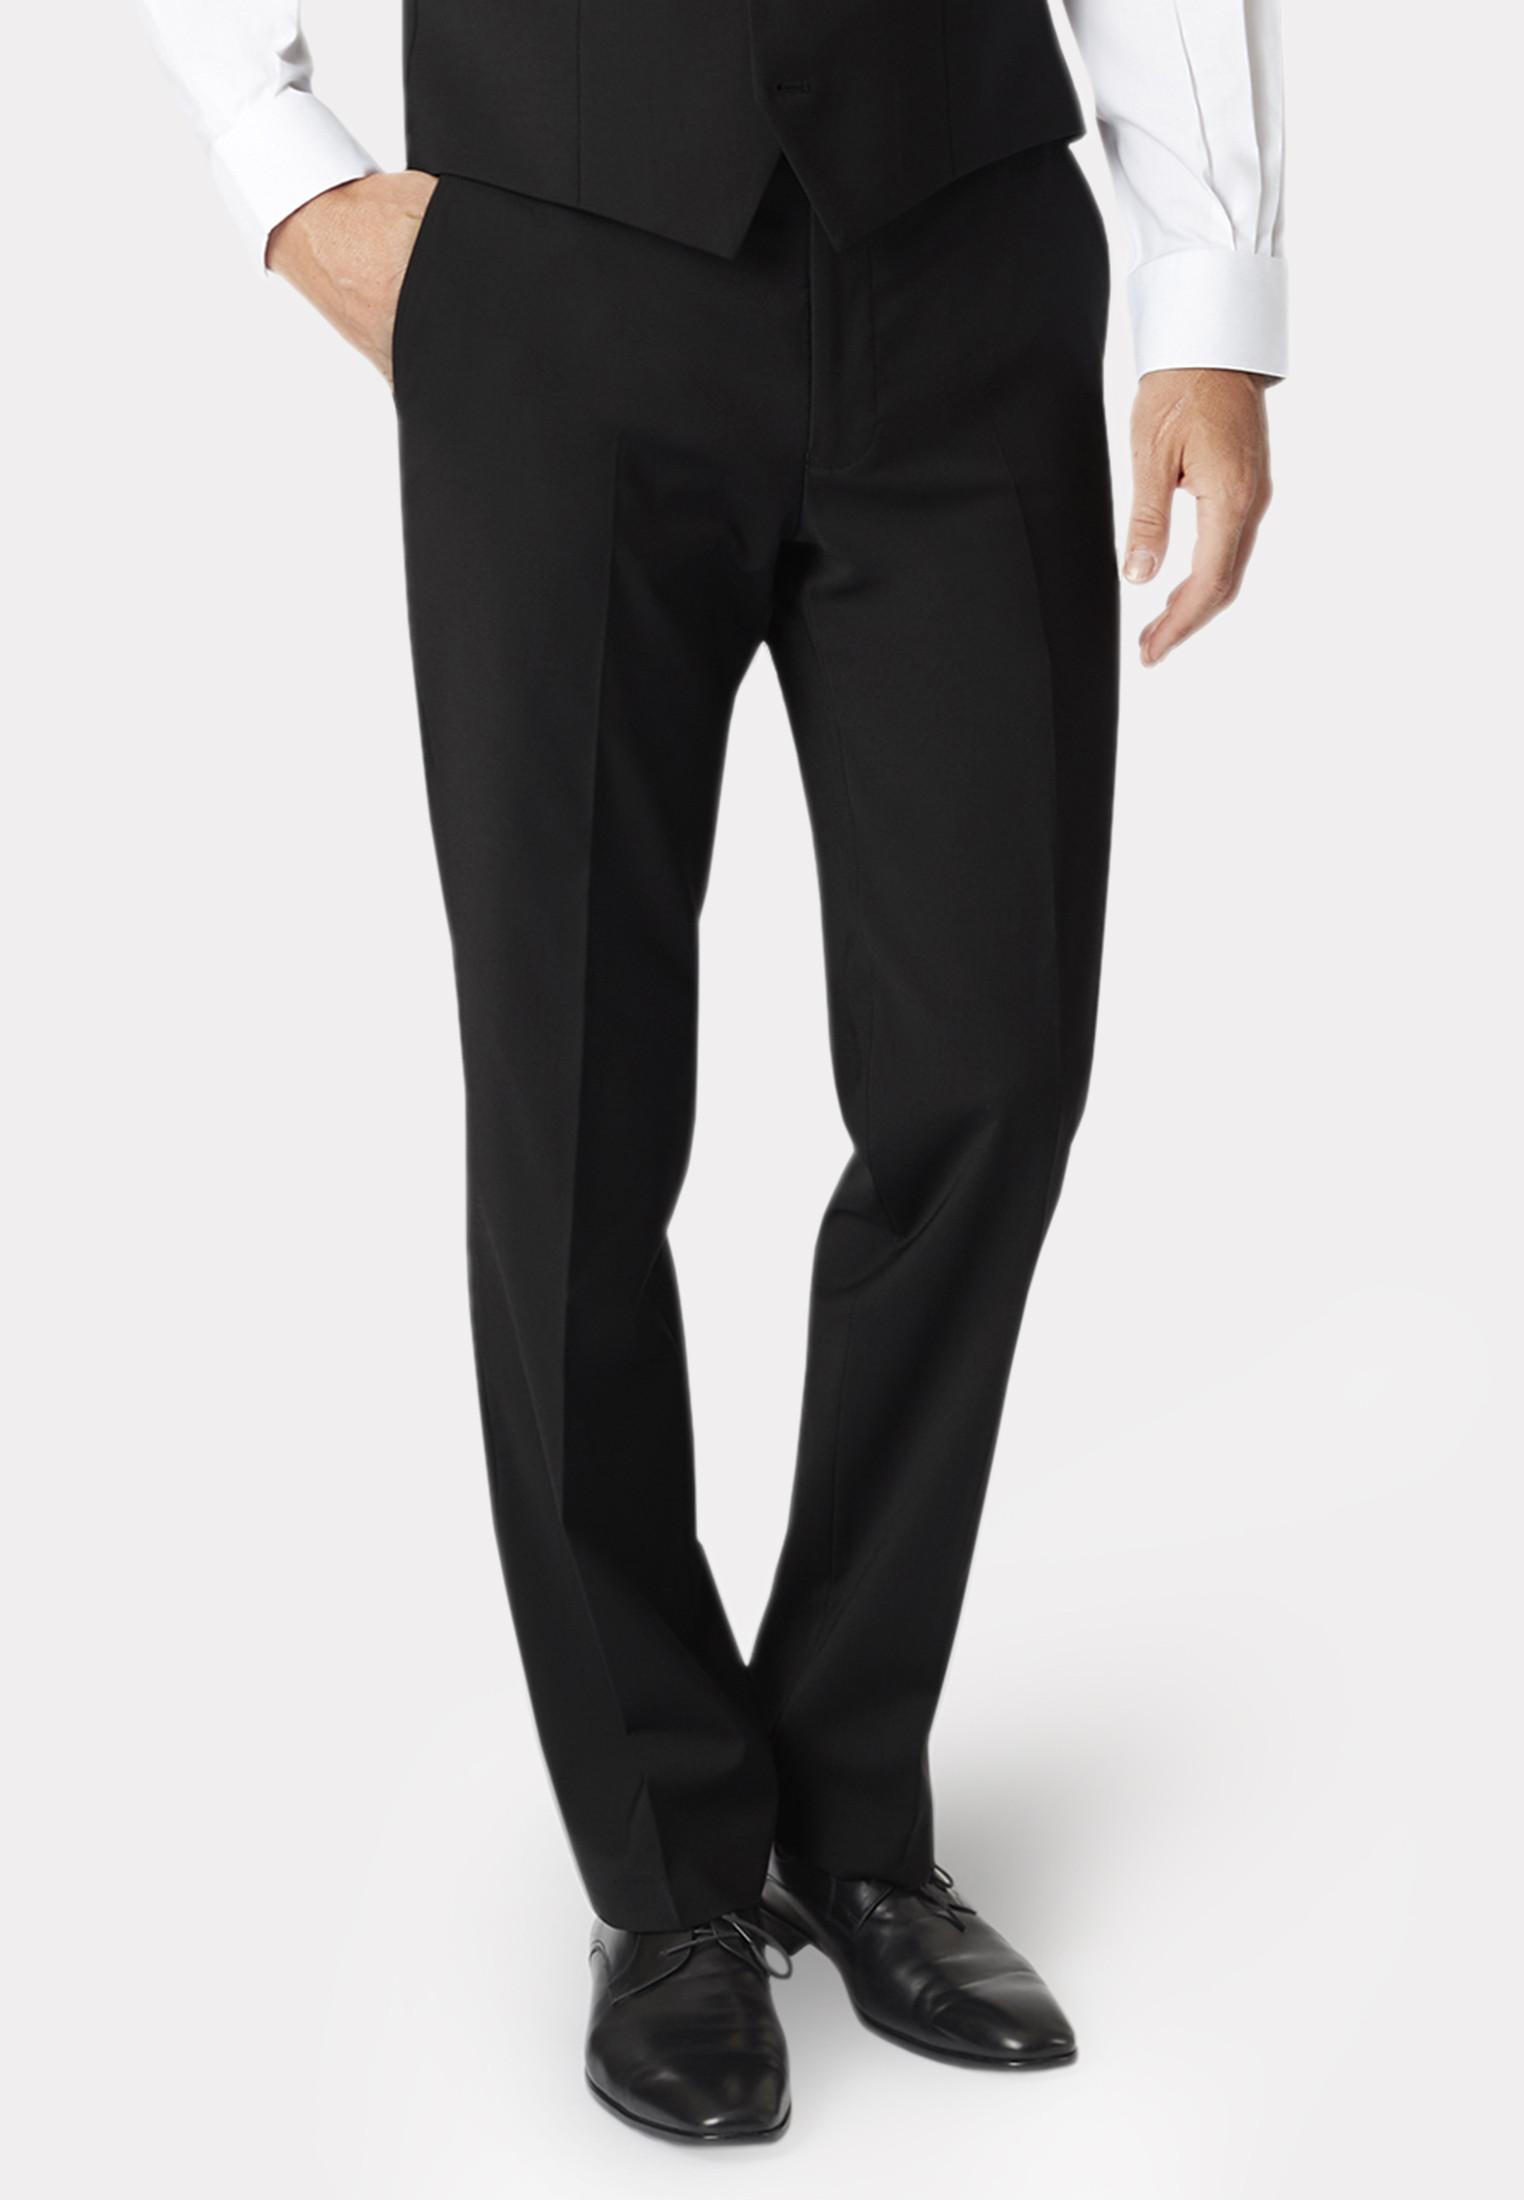 Avalino Black Three Piece Travel Suit - Waistcoat Optional